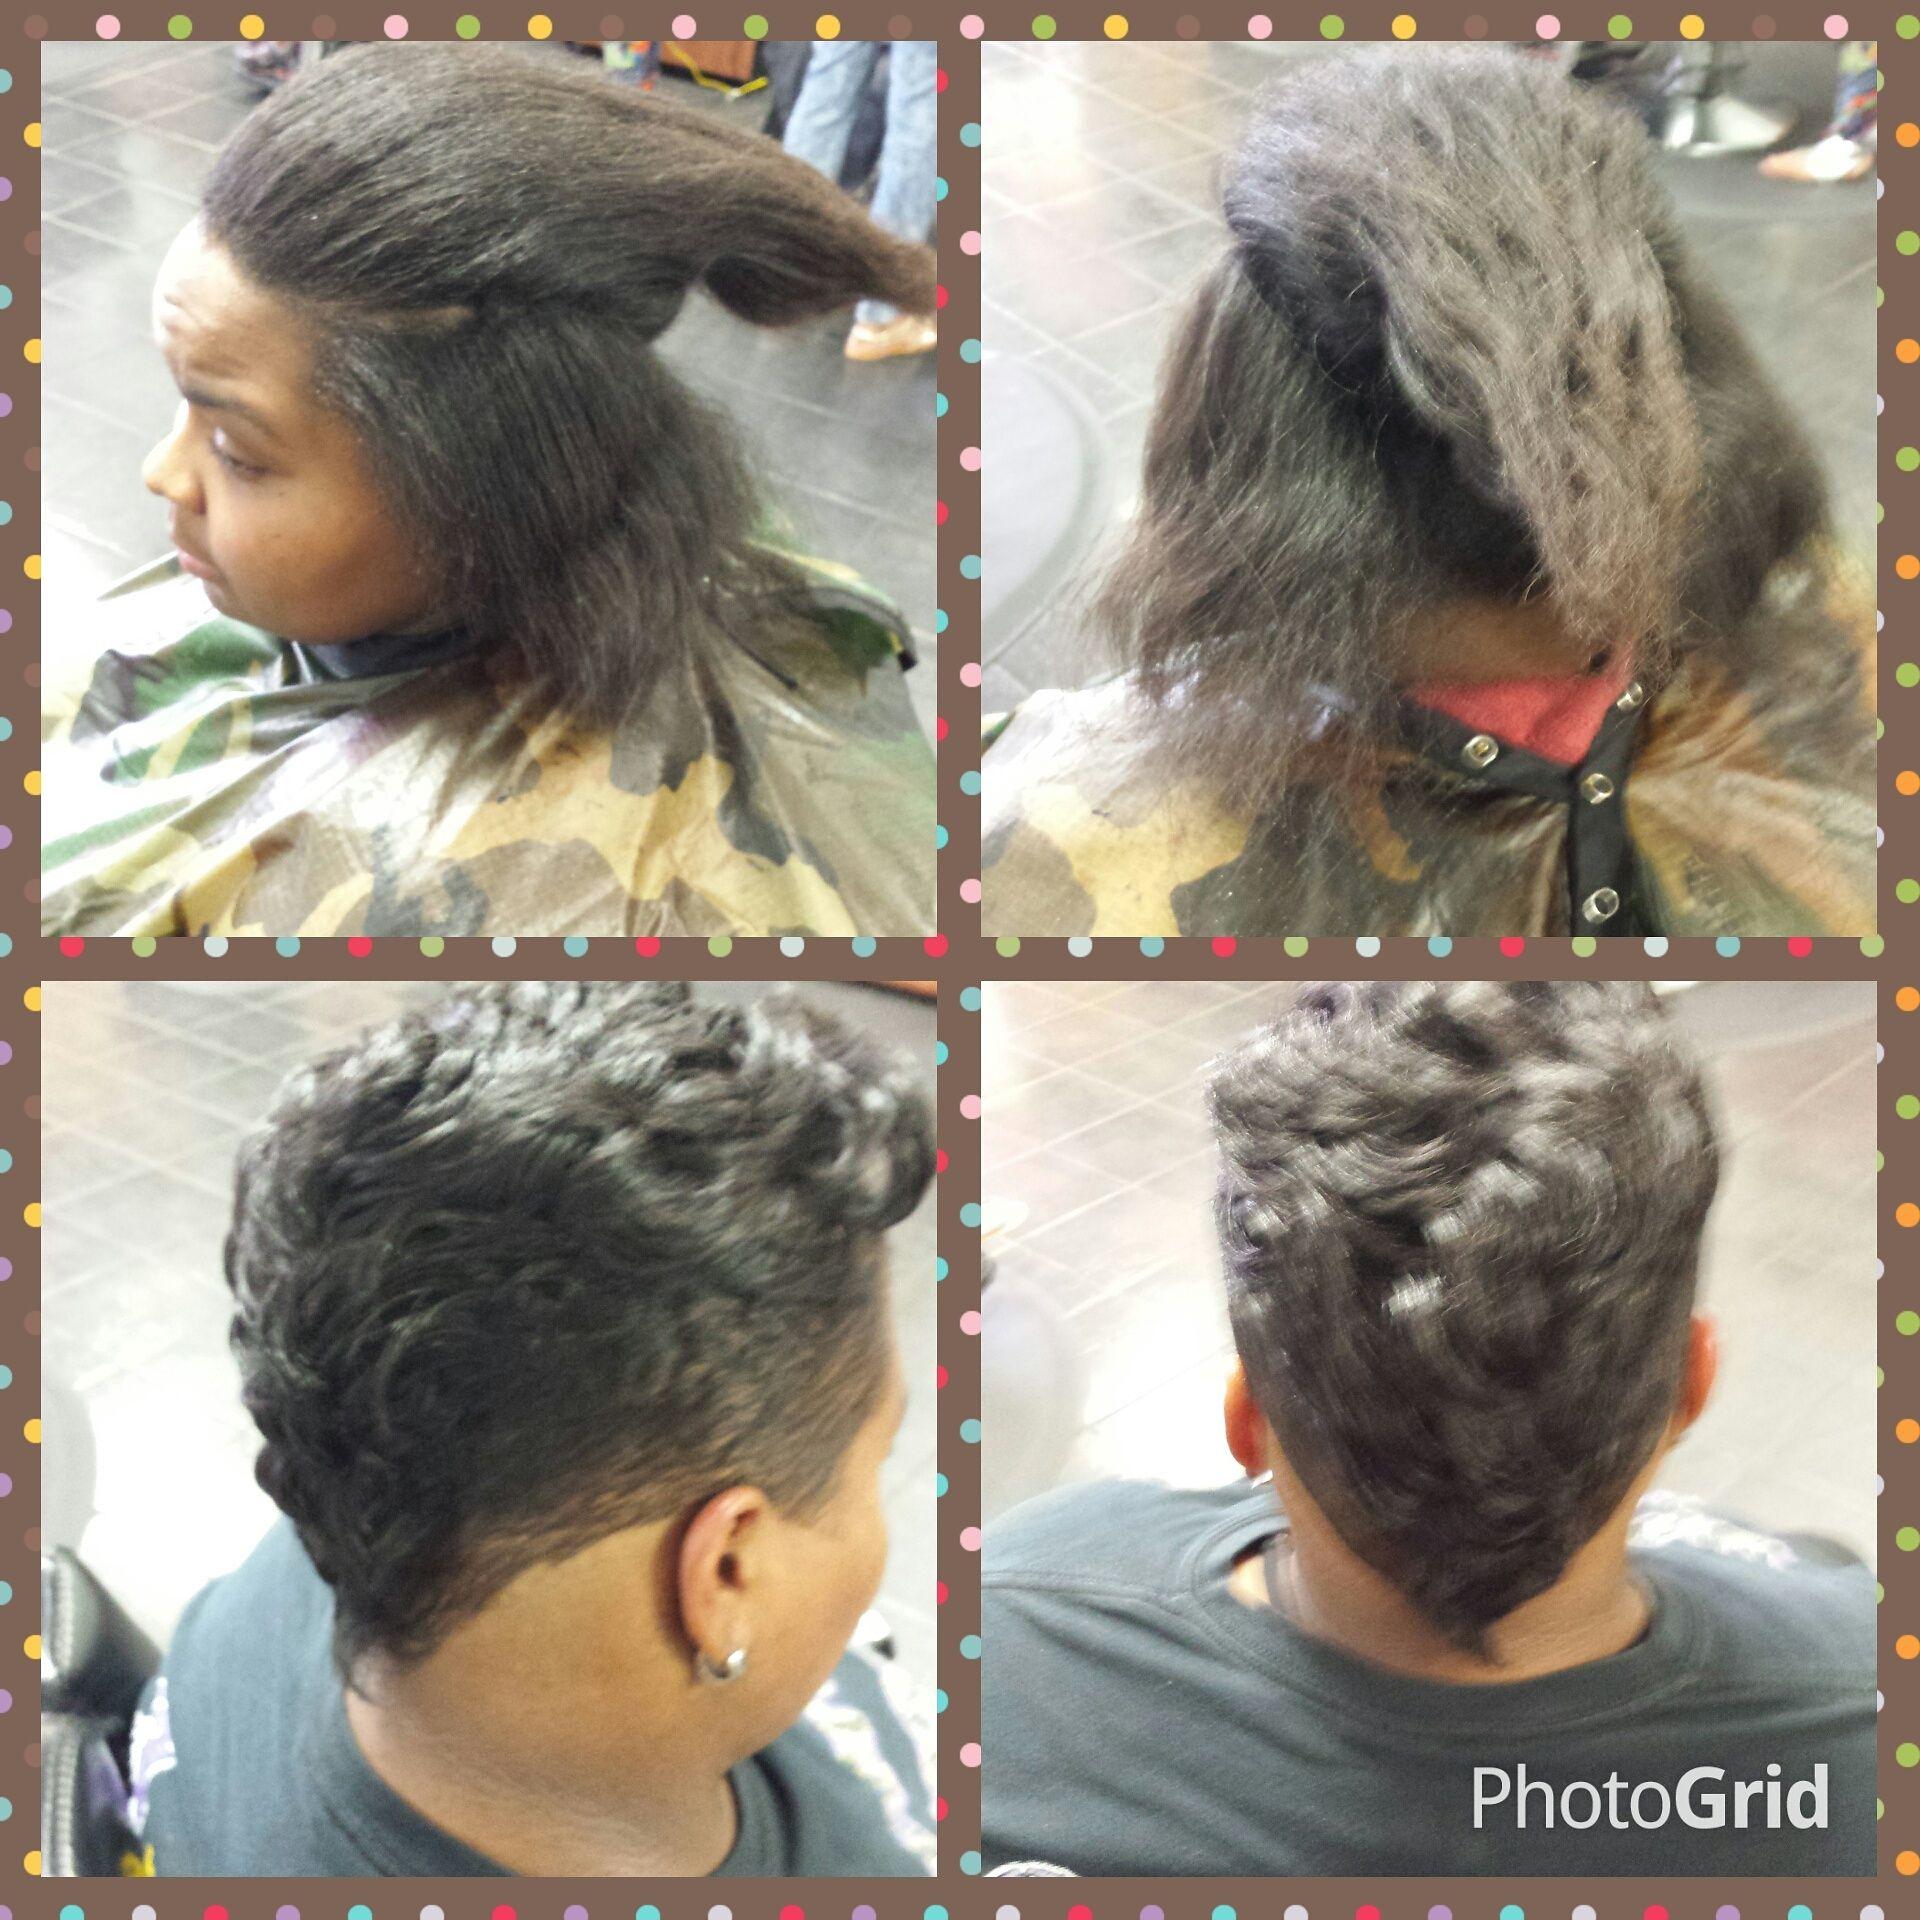 Short Haircut Makeover At Trendz By Tammy Hair Salon Houston Pearland Tx Black Hair Salons Short Hair Styles Pixie Pixie Haircut